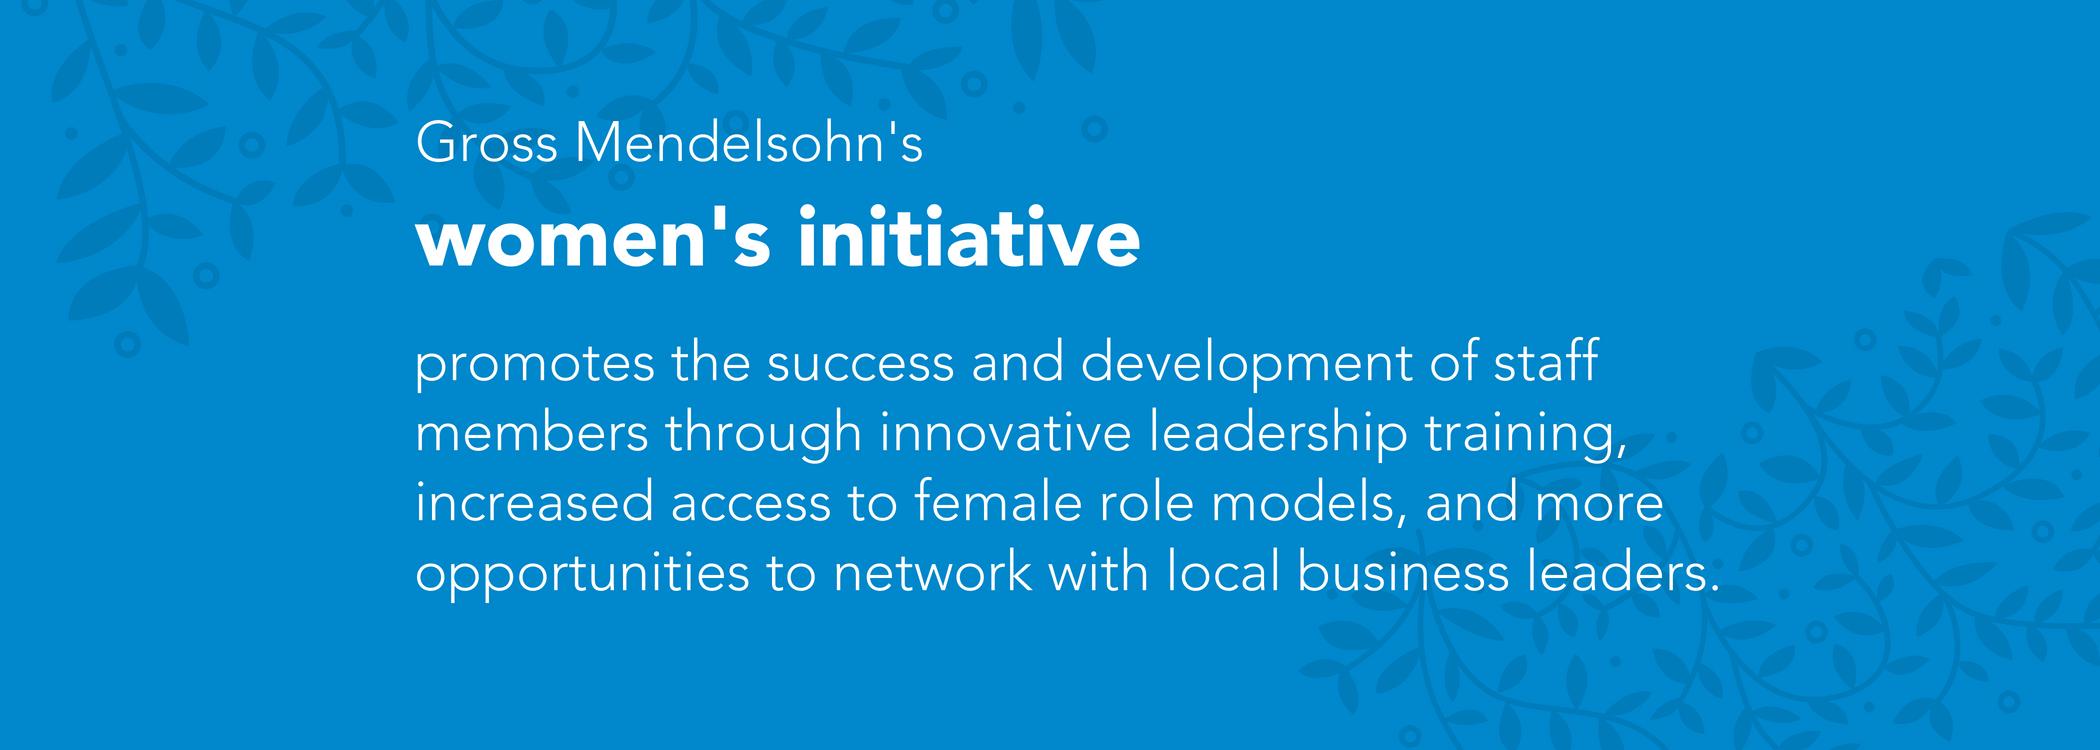 Women's Initiative Mission